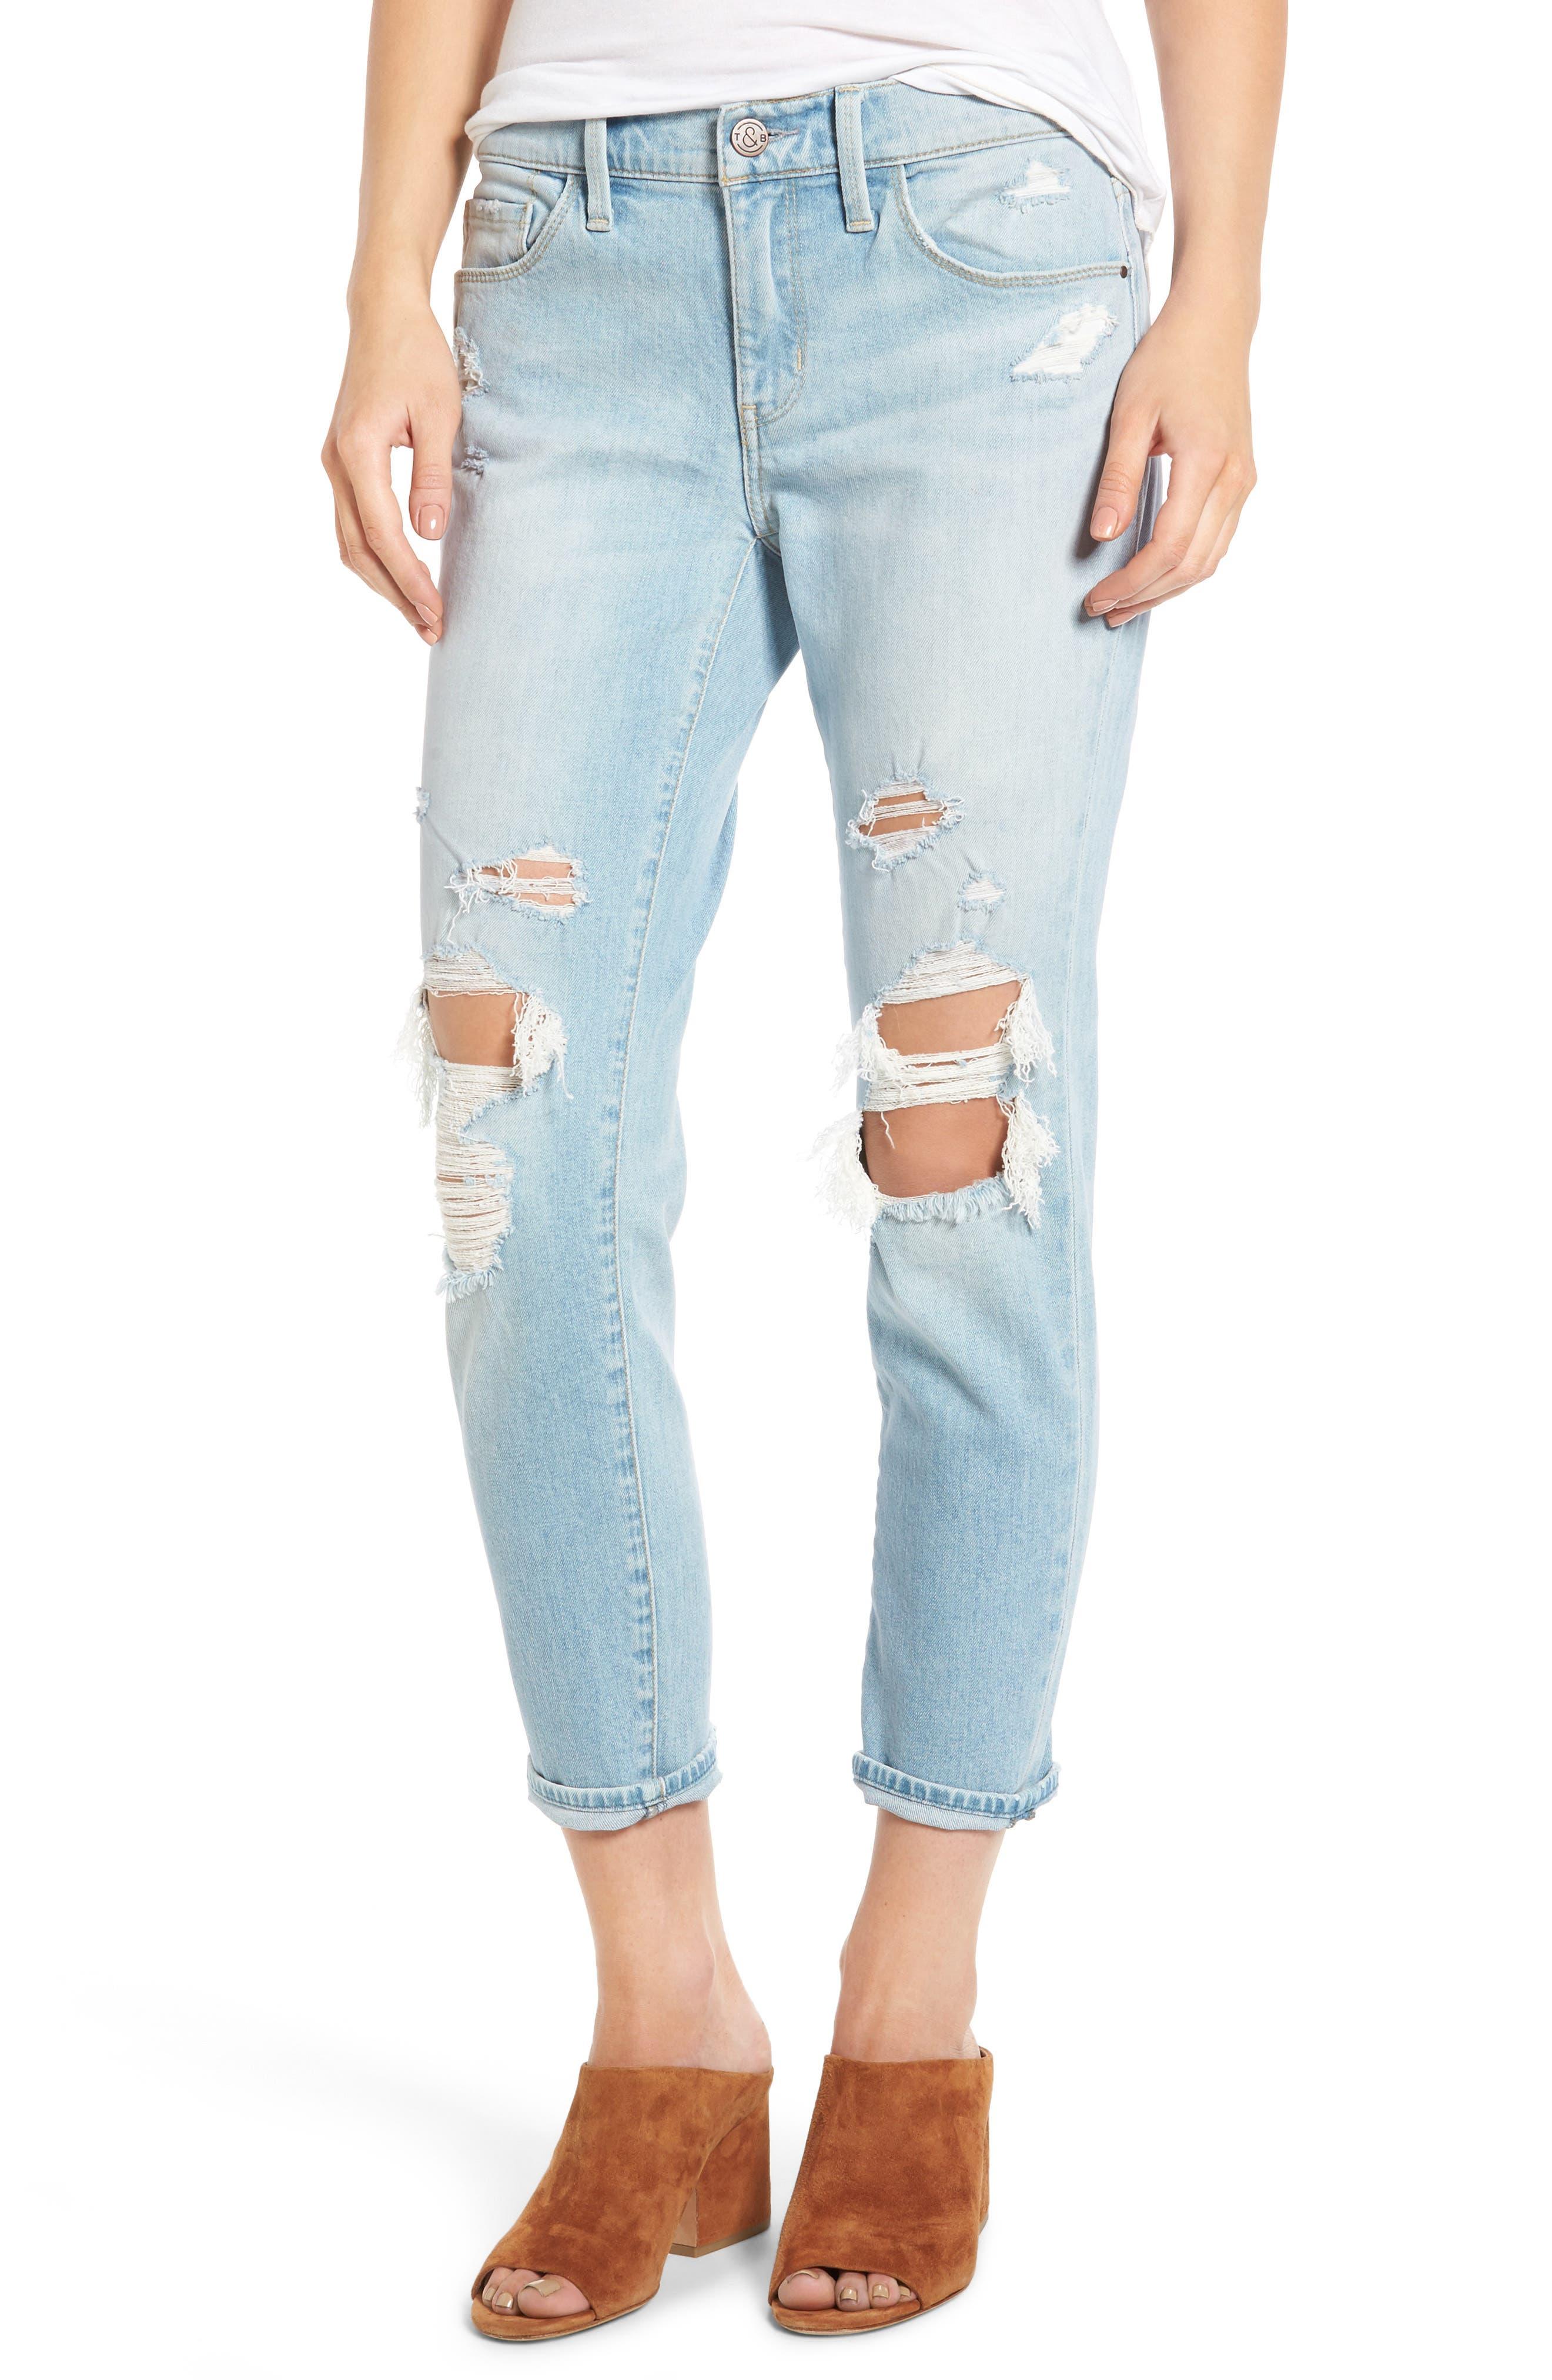 TREASURE & BOND Skinny Boyfriend Jeans, Main, color, 400